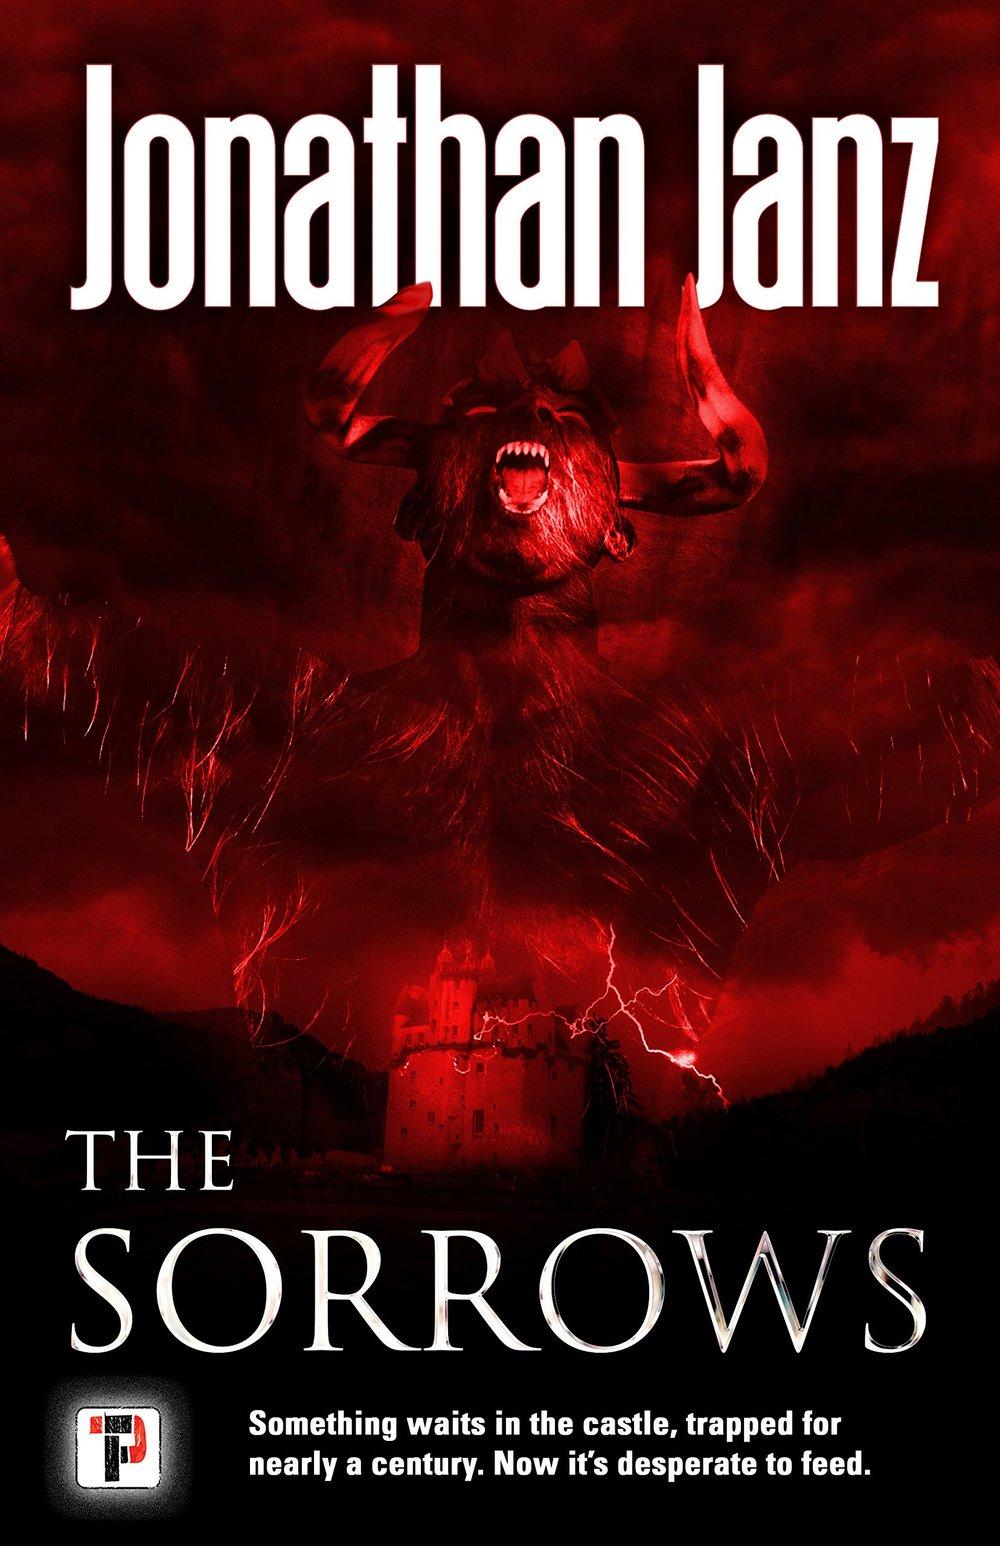 The Sorrows_Jonathan Janz.jpg